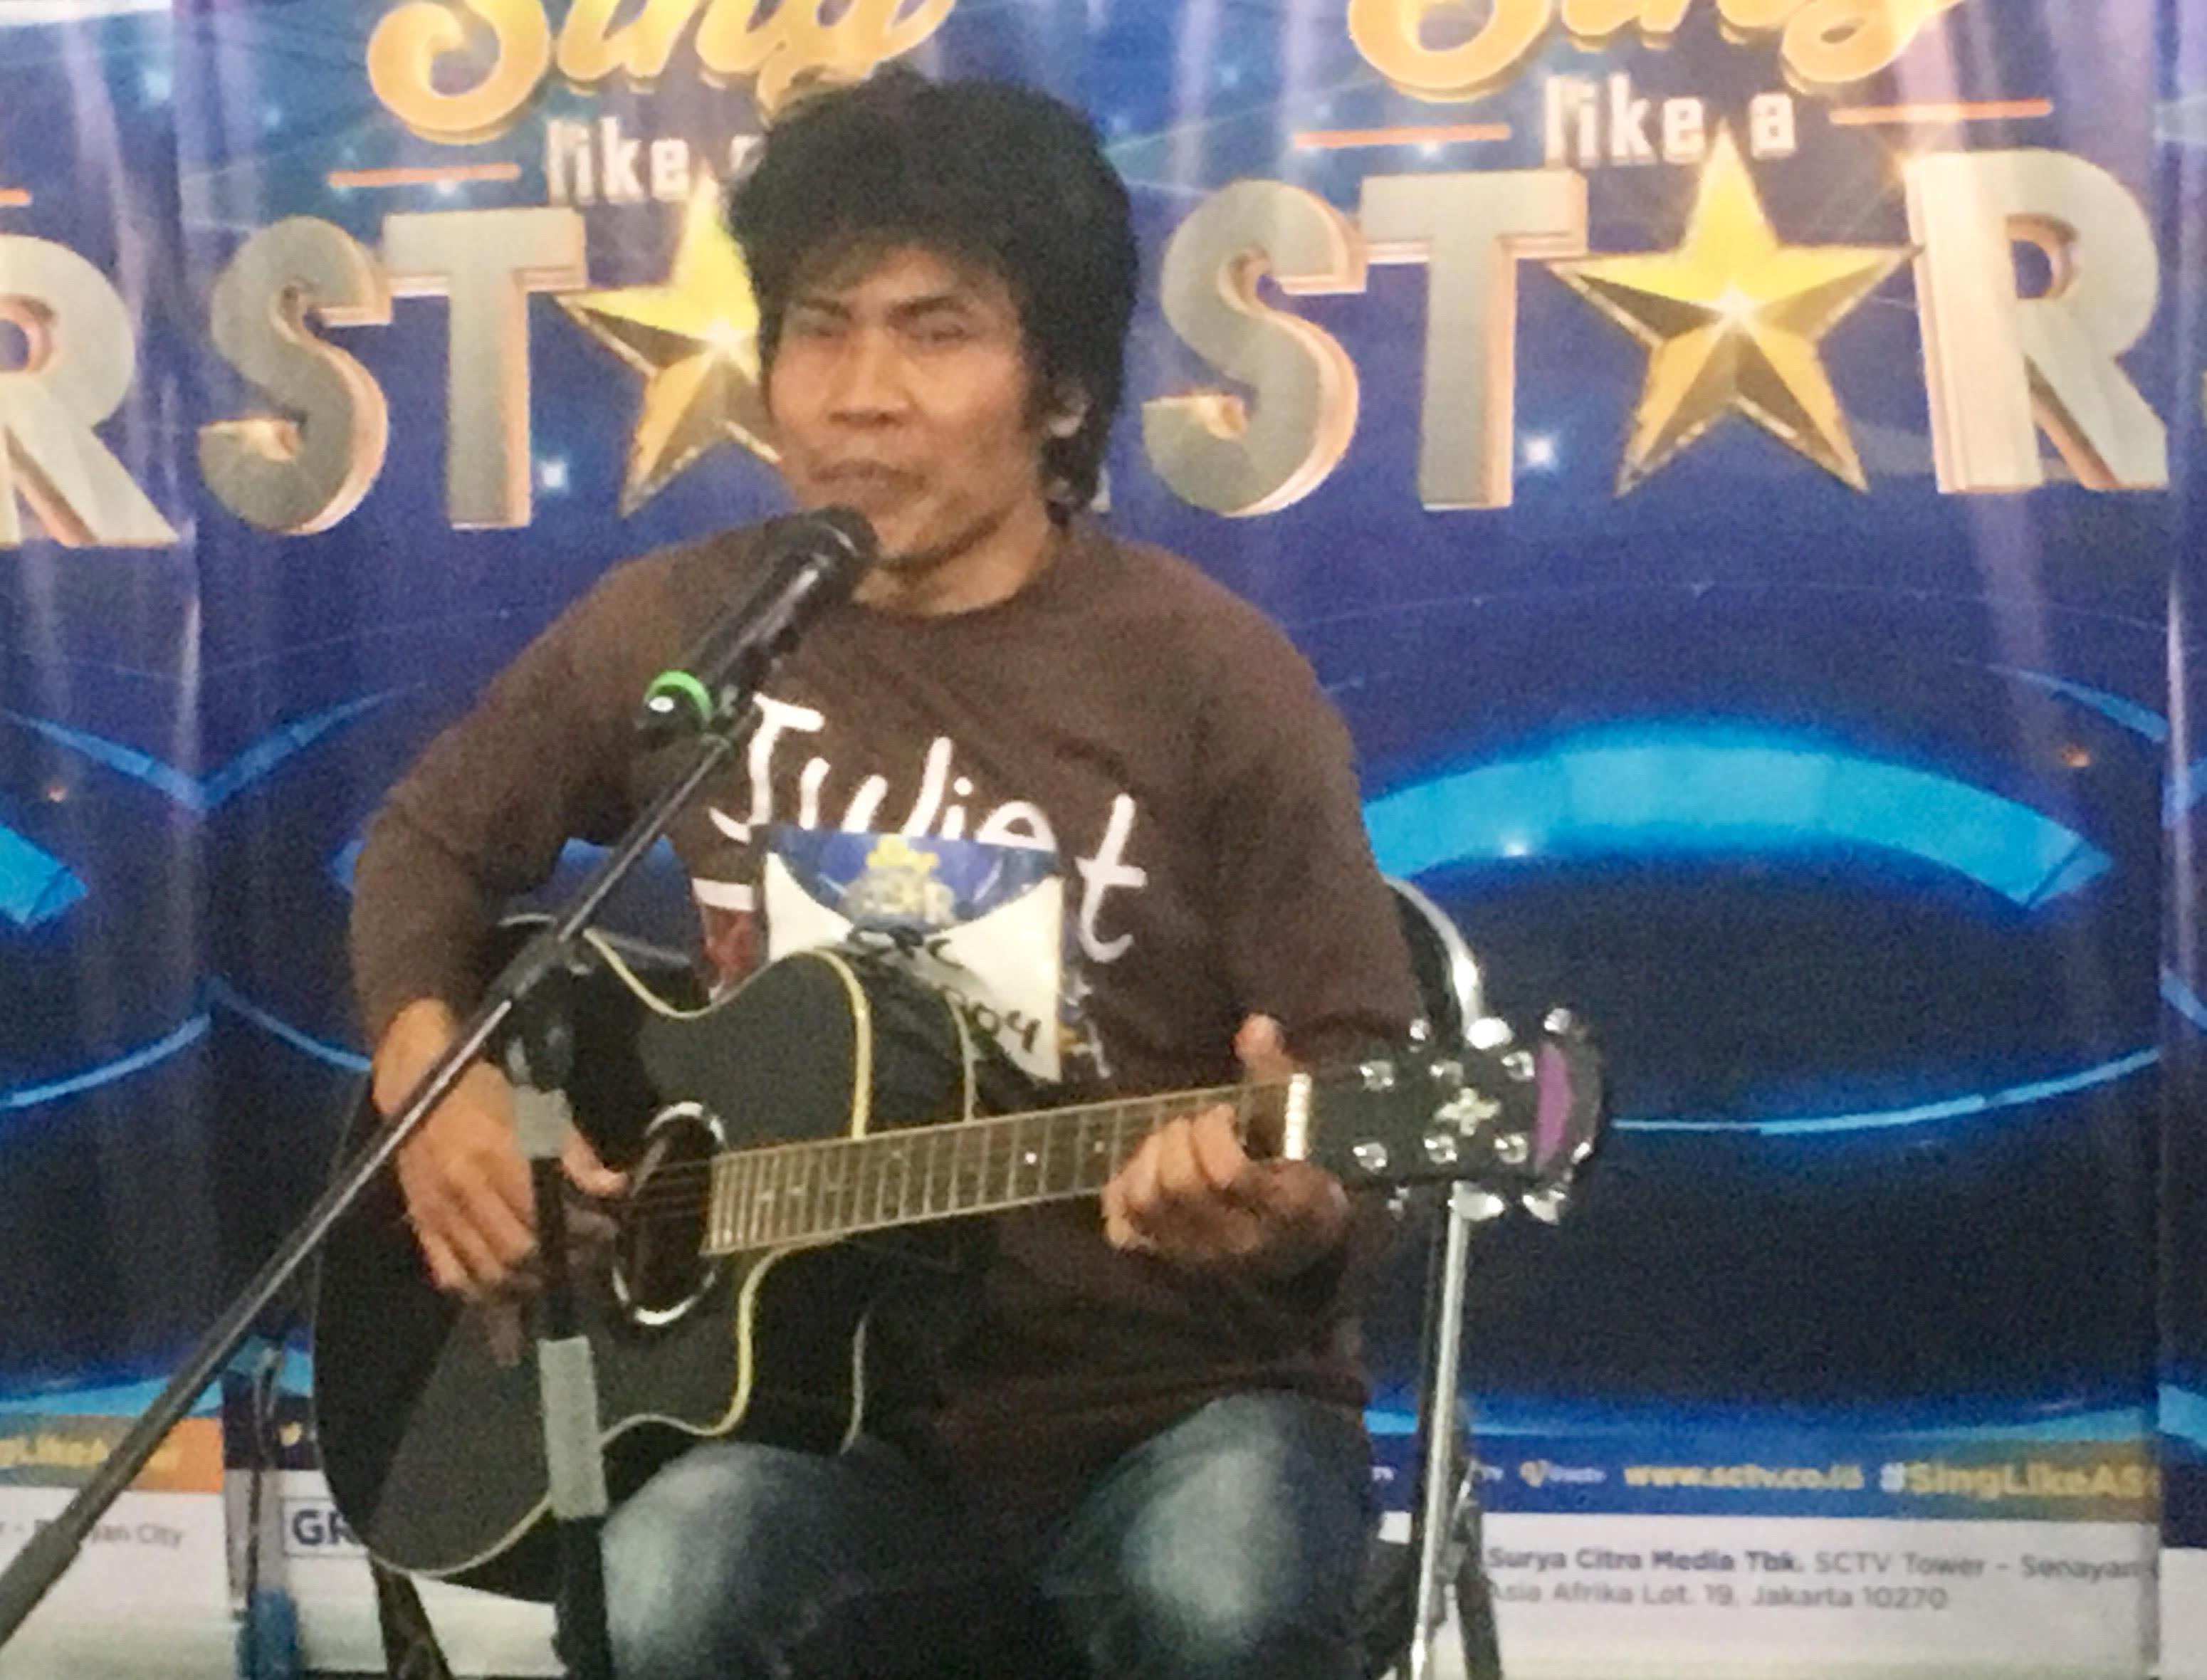 sing a ike star3